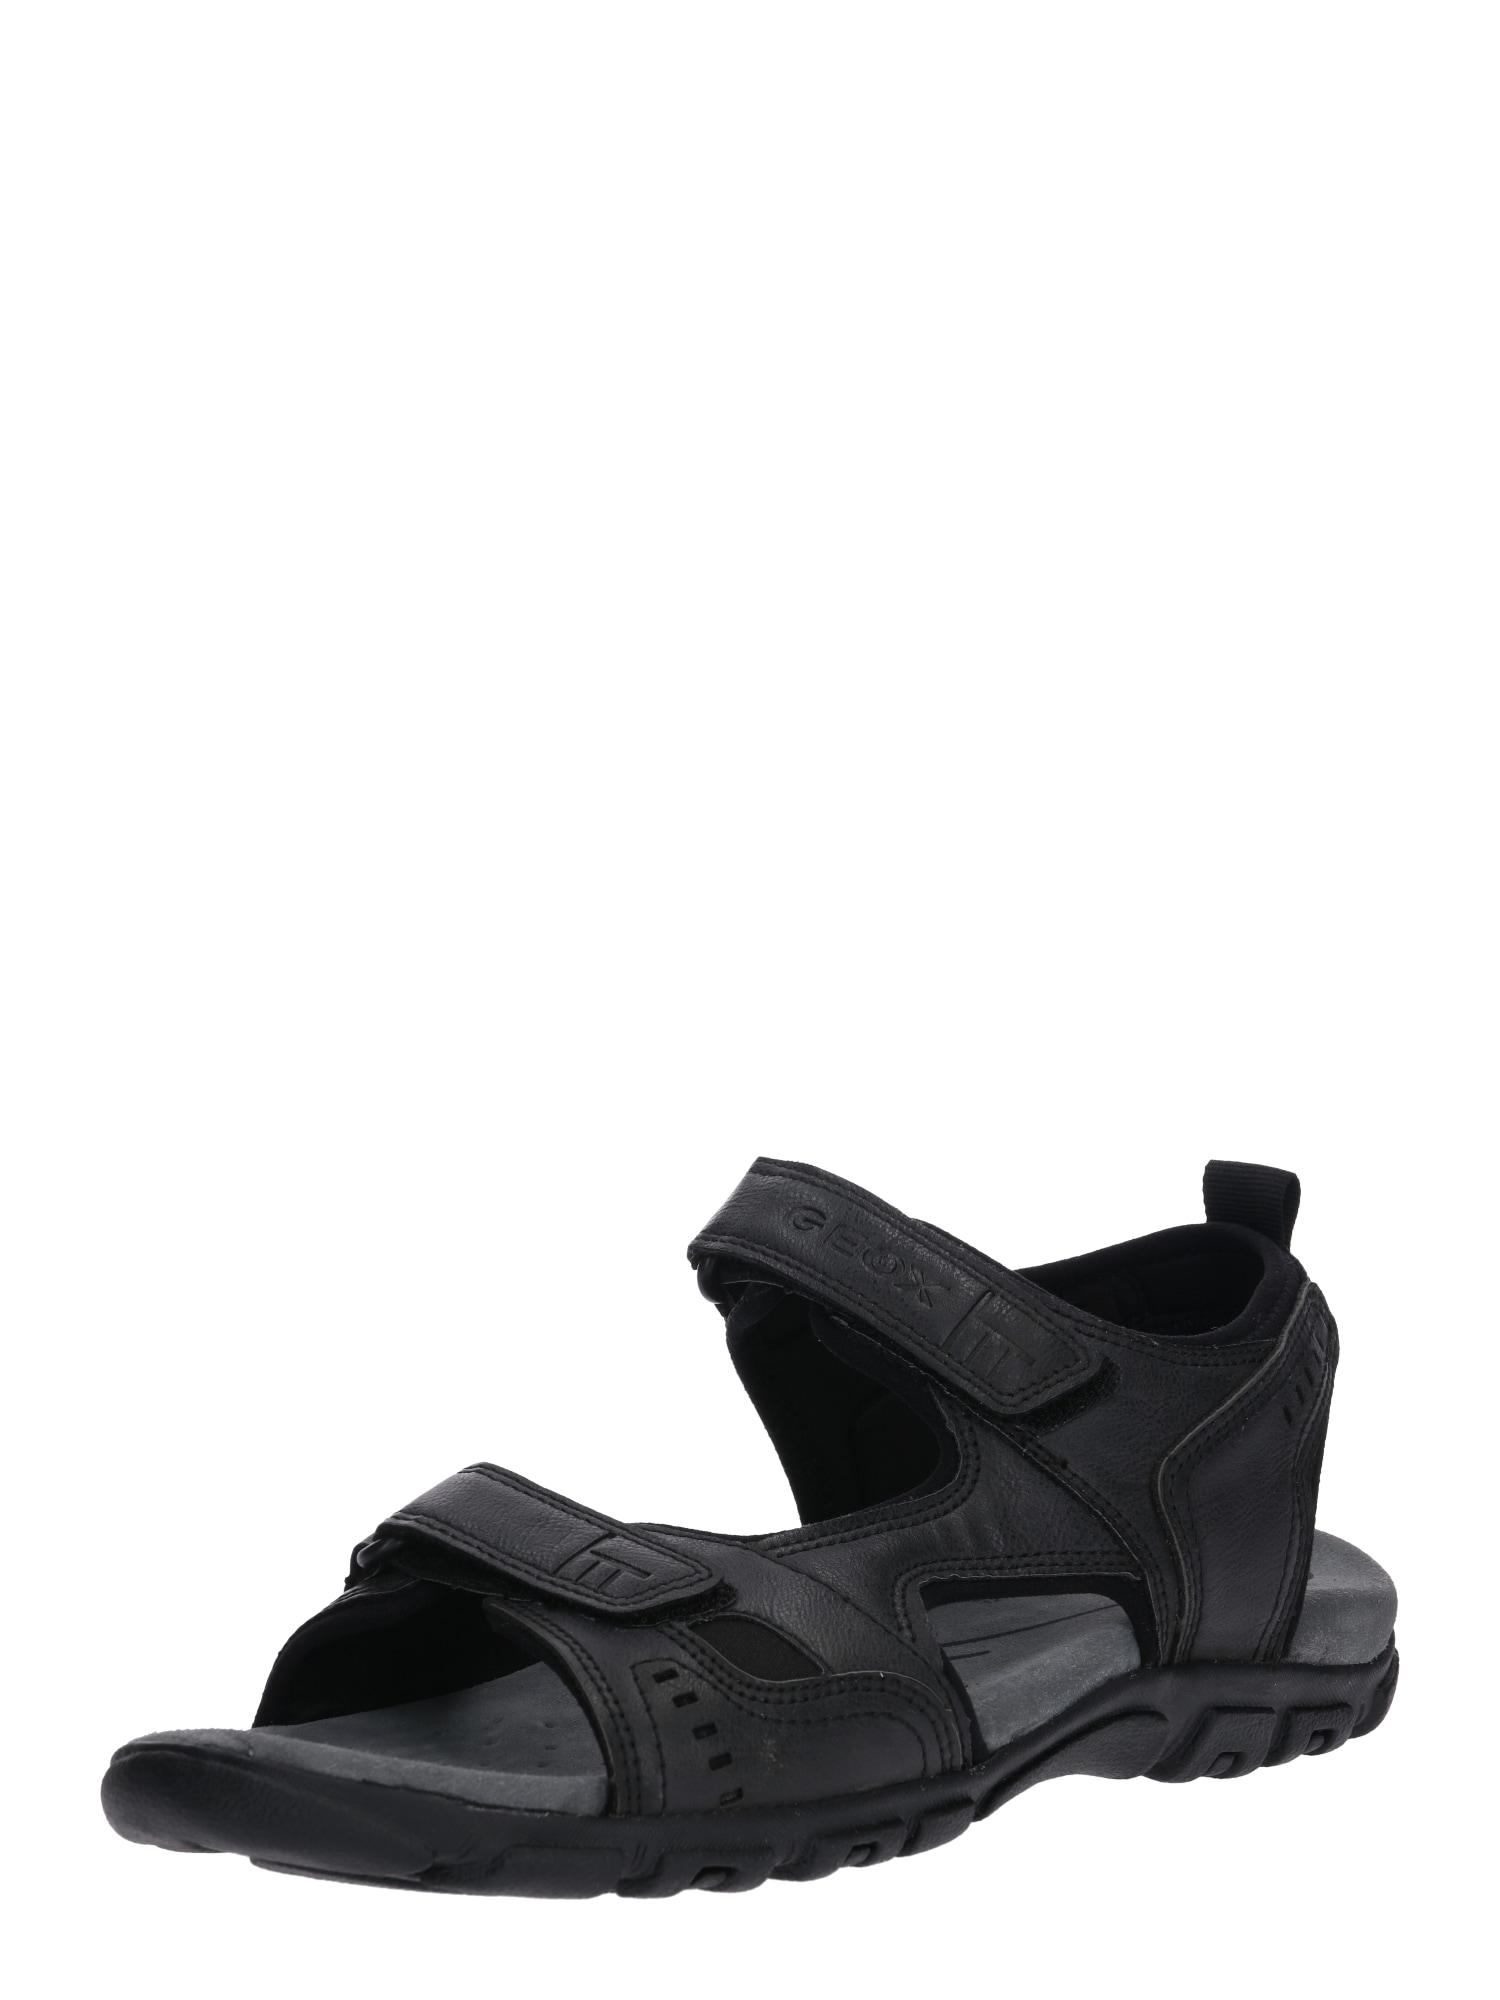 Sandály UOMO STRADA černá GEOX